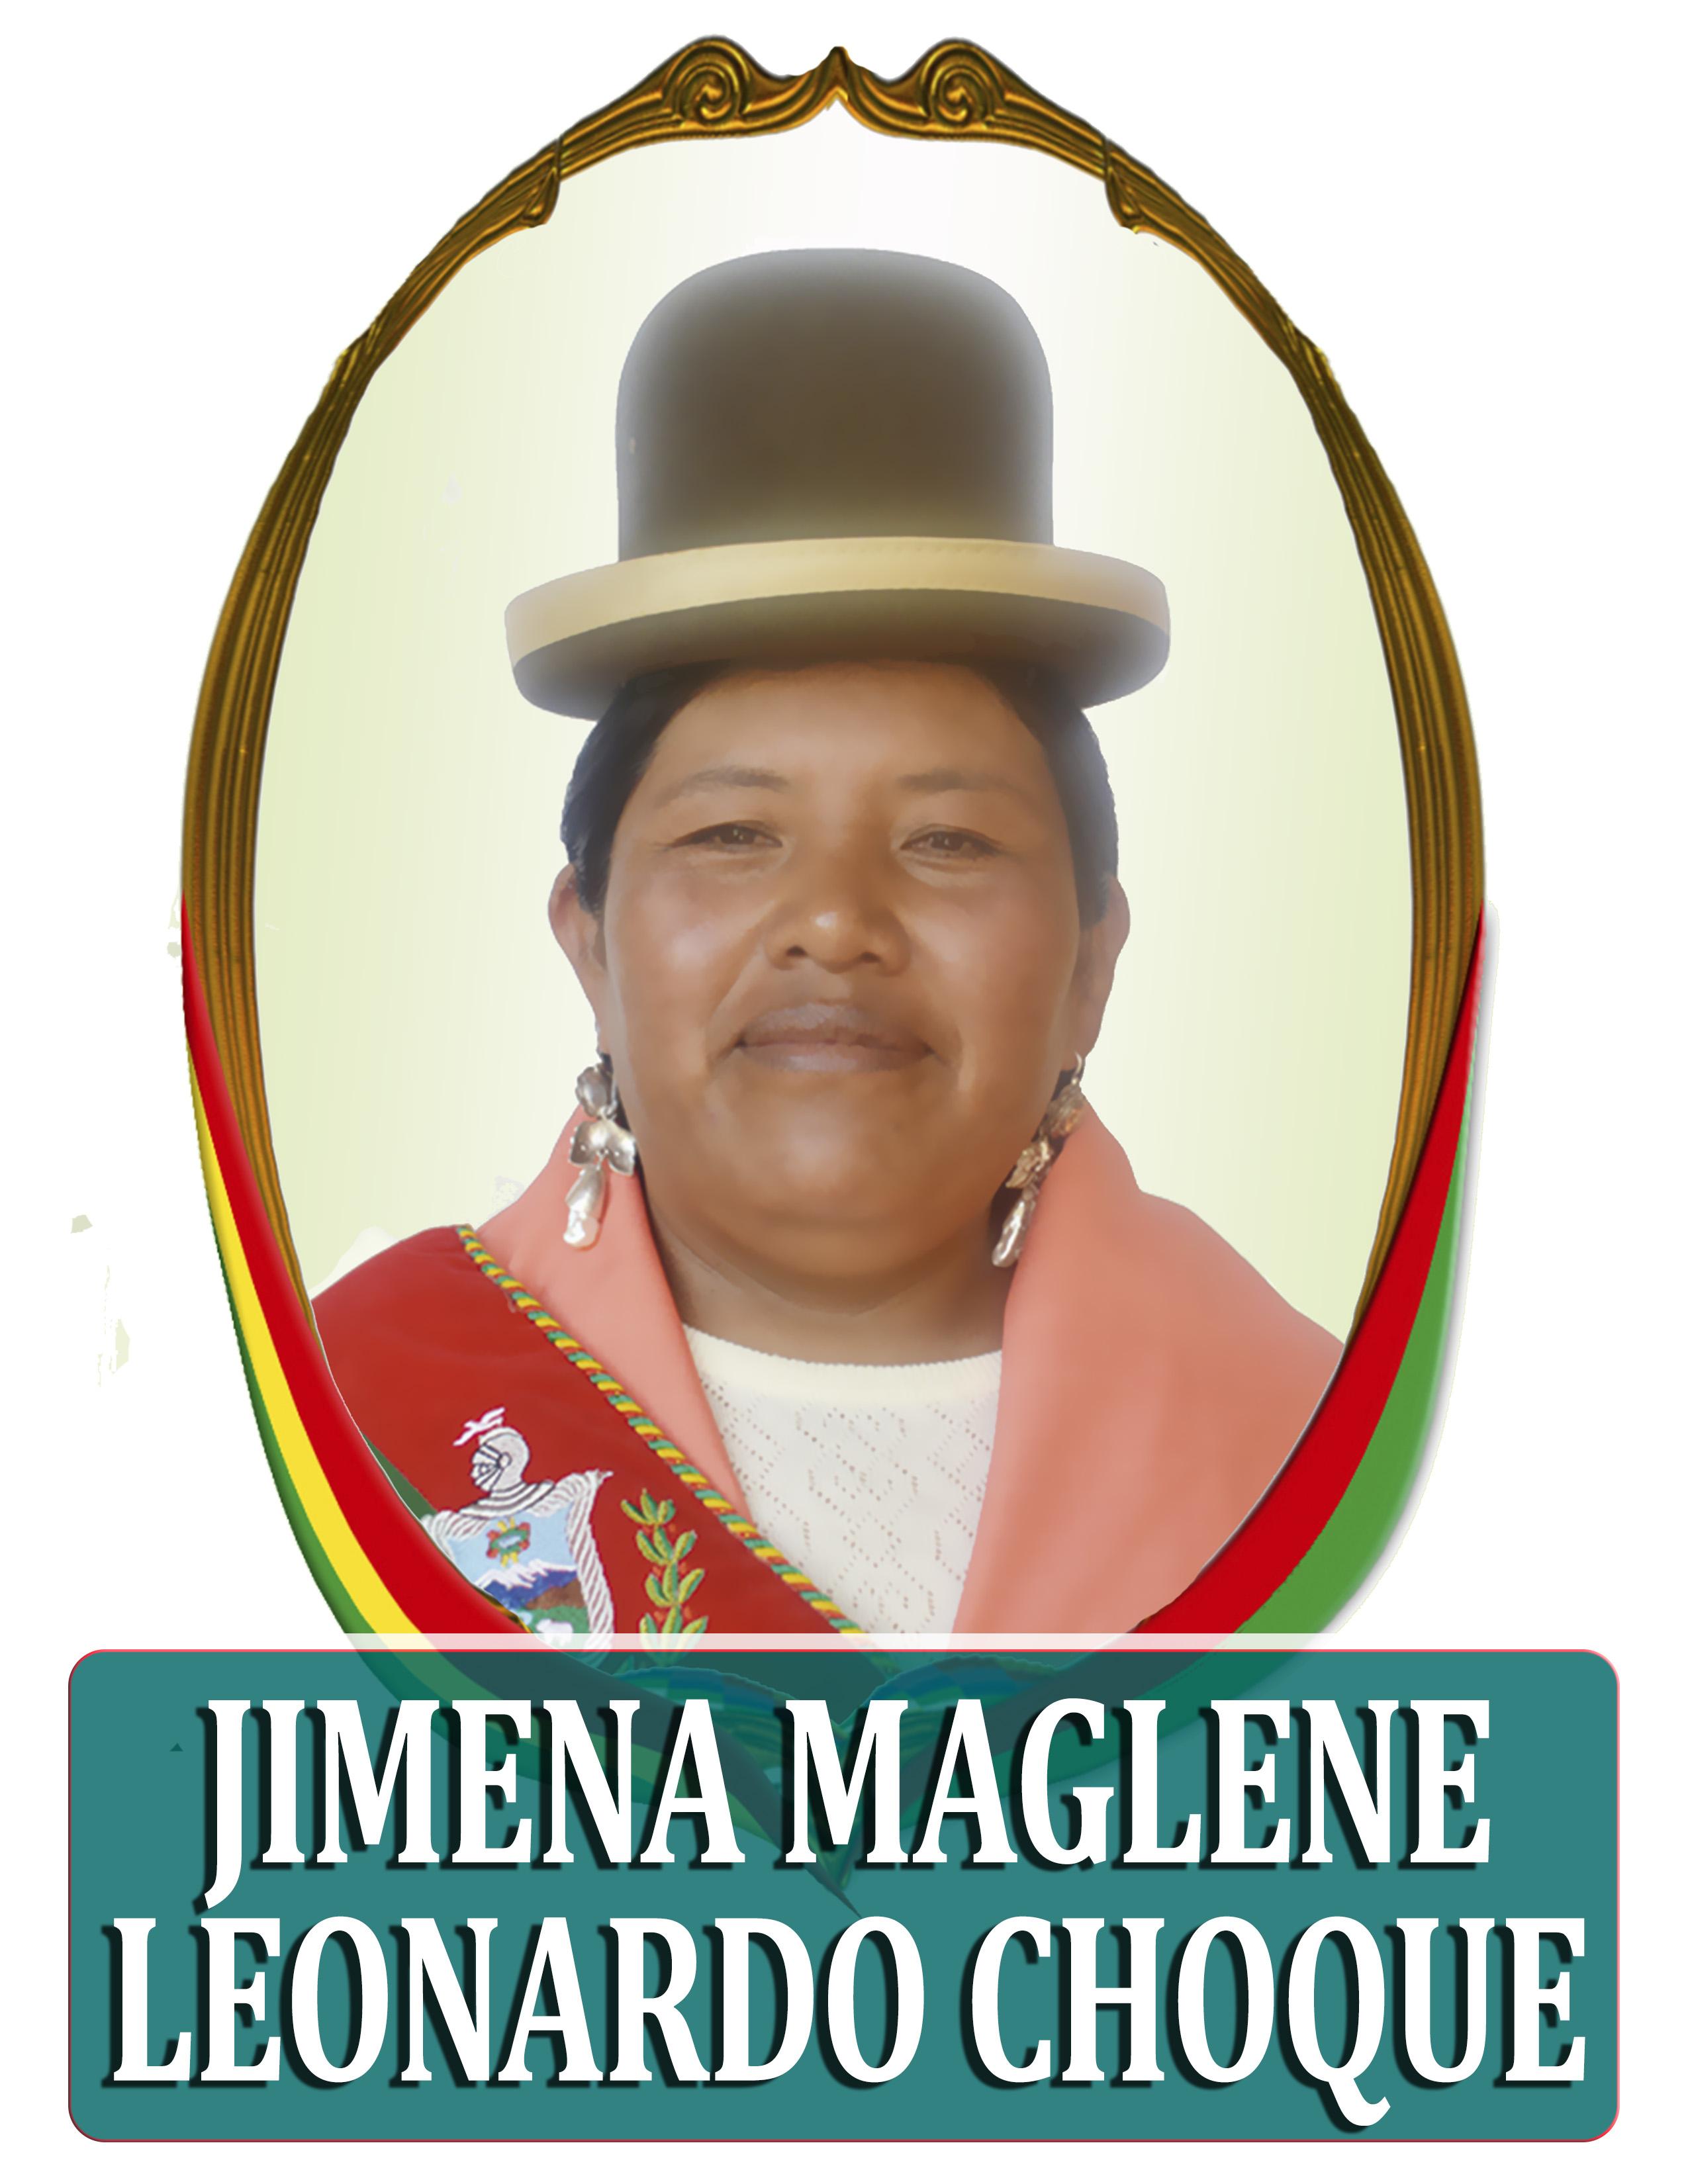 JIMENA MAGLENE LEONARDO CHOQUE